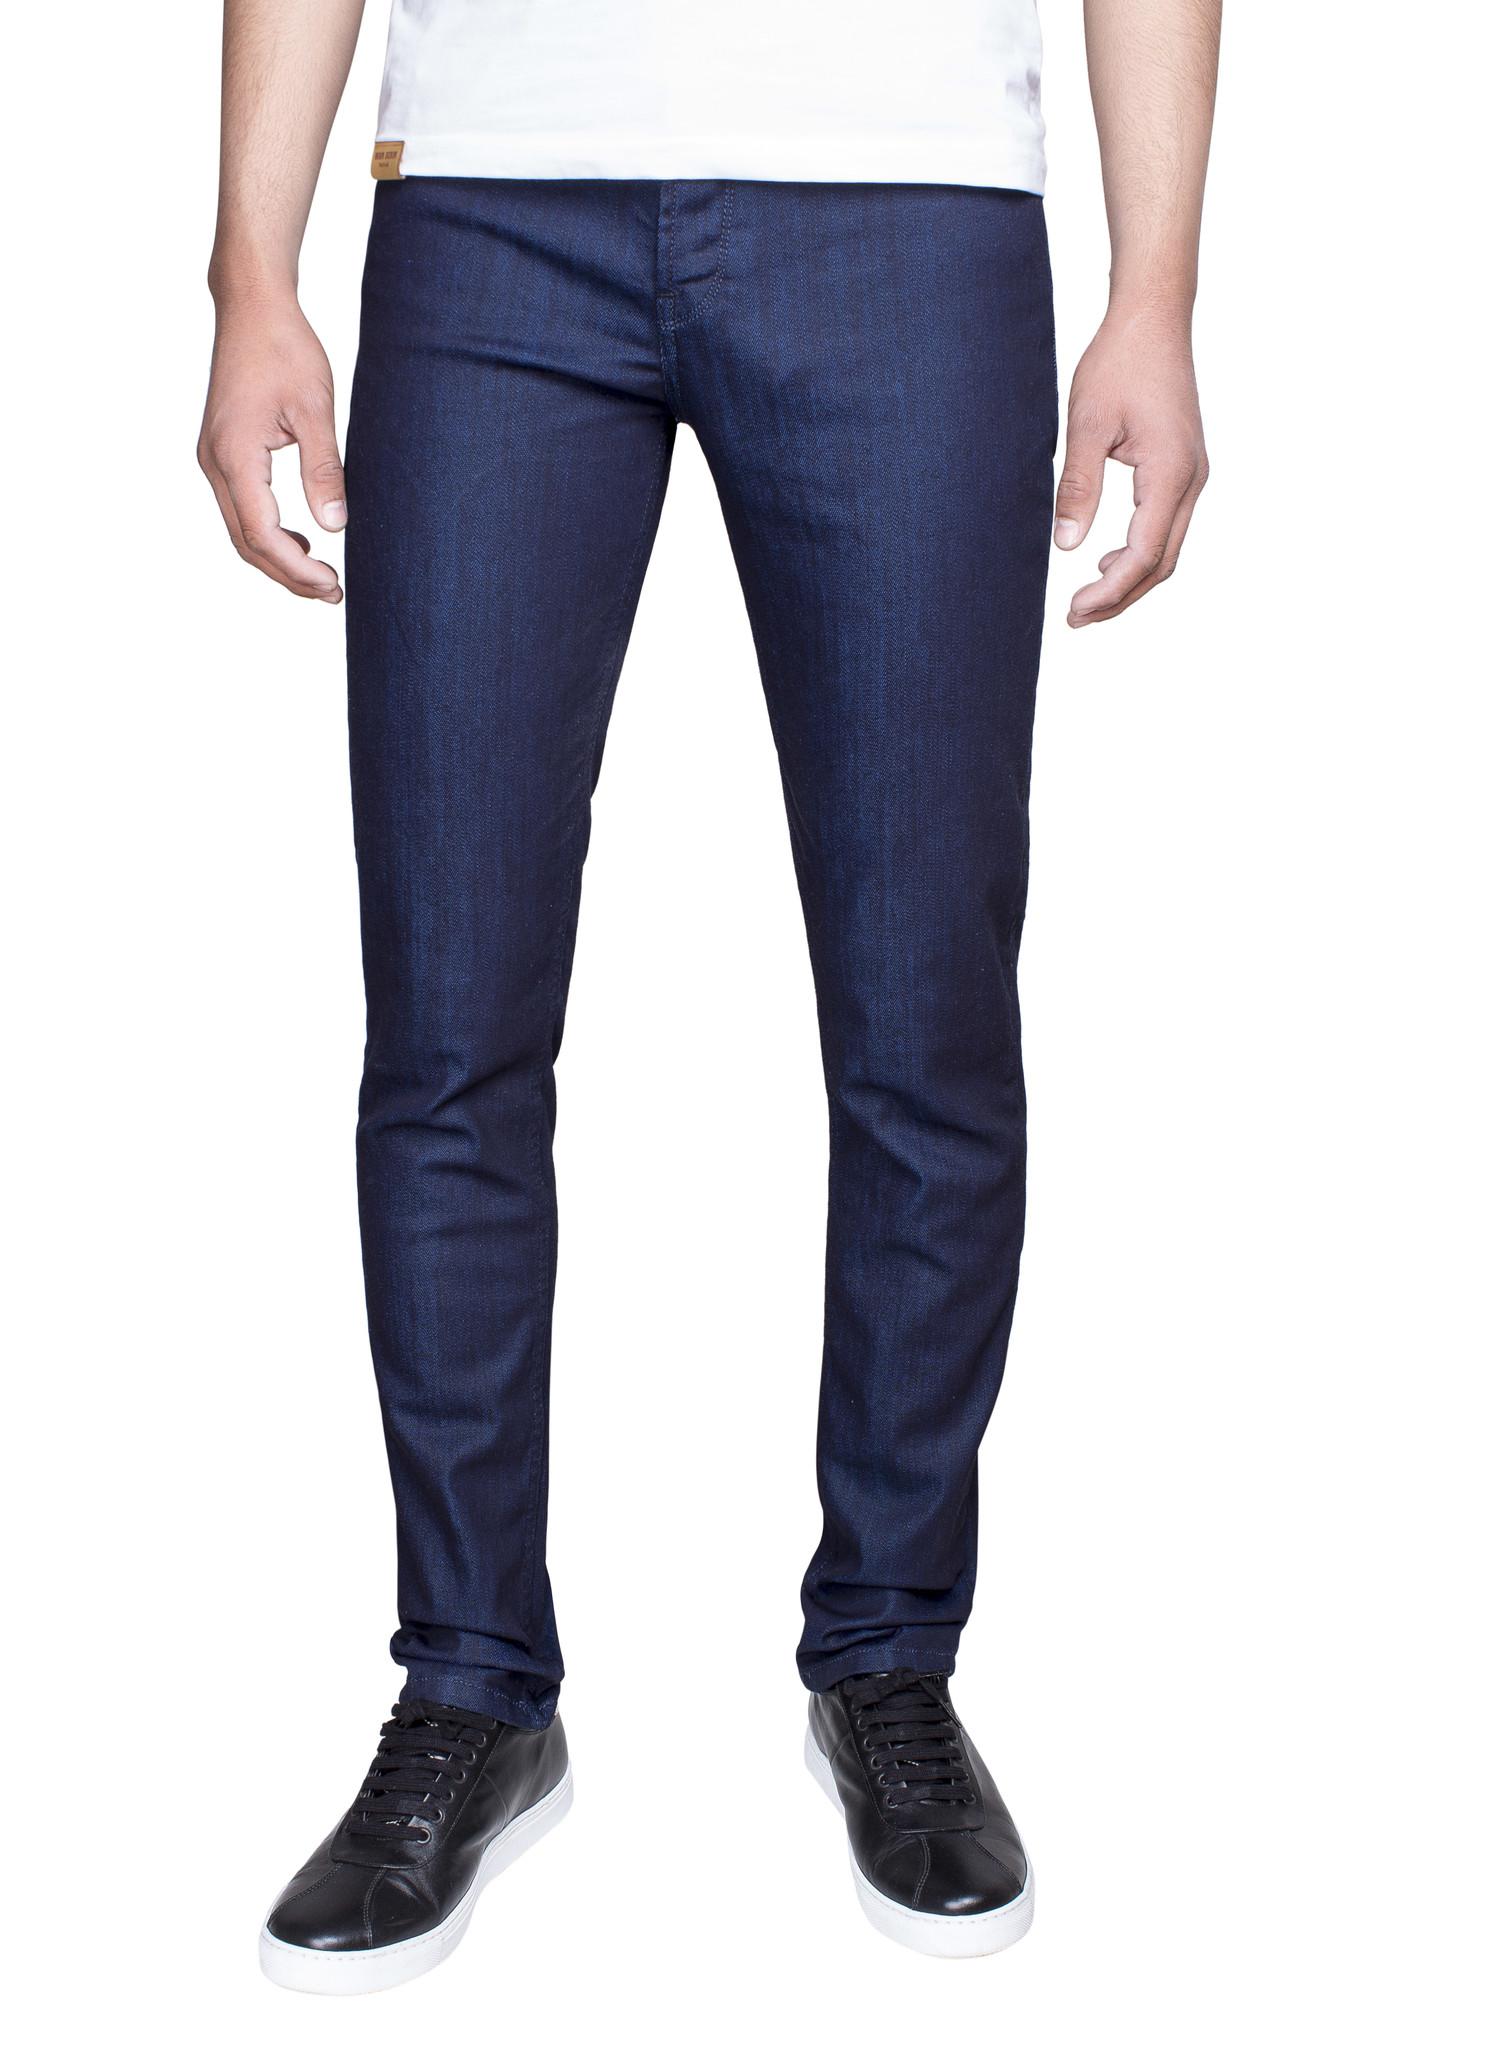 Gaznawi Jeans 68016 Navy Blue Maat: 38/34